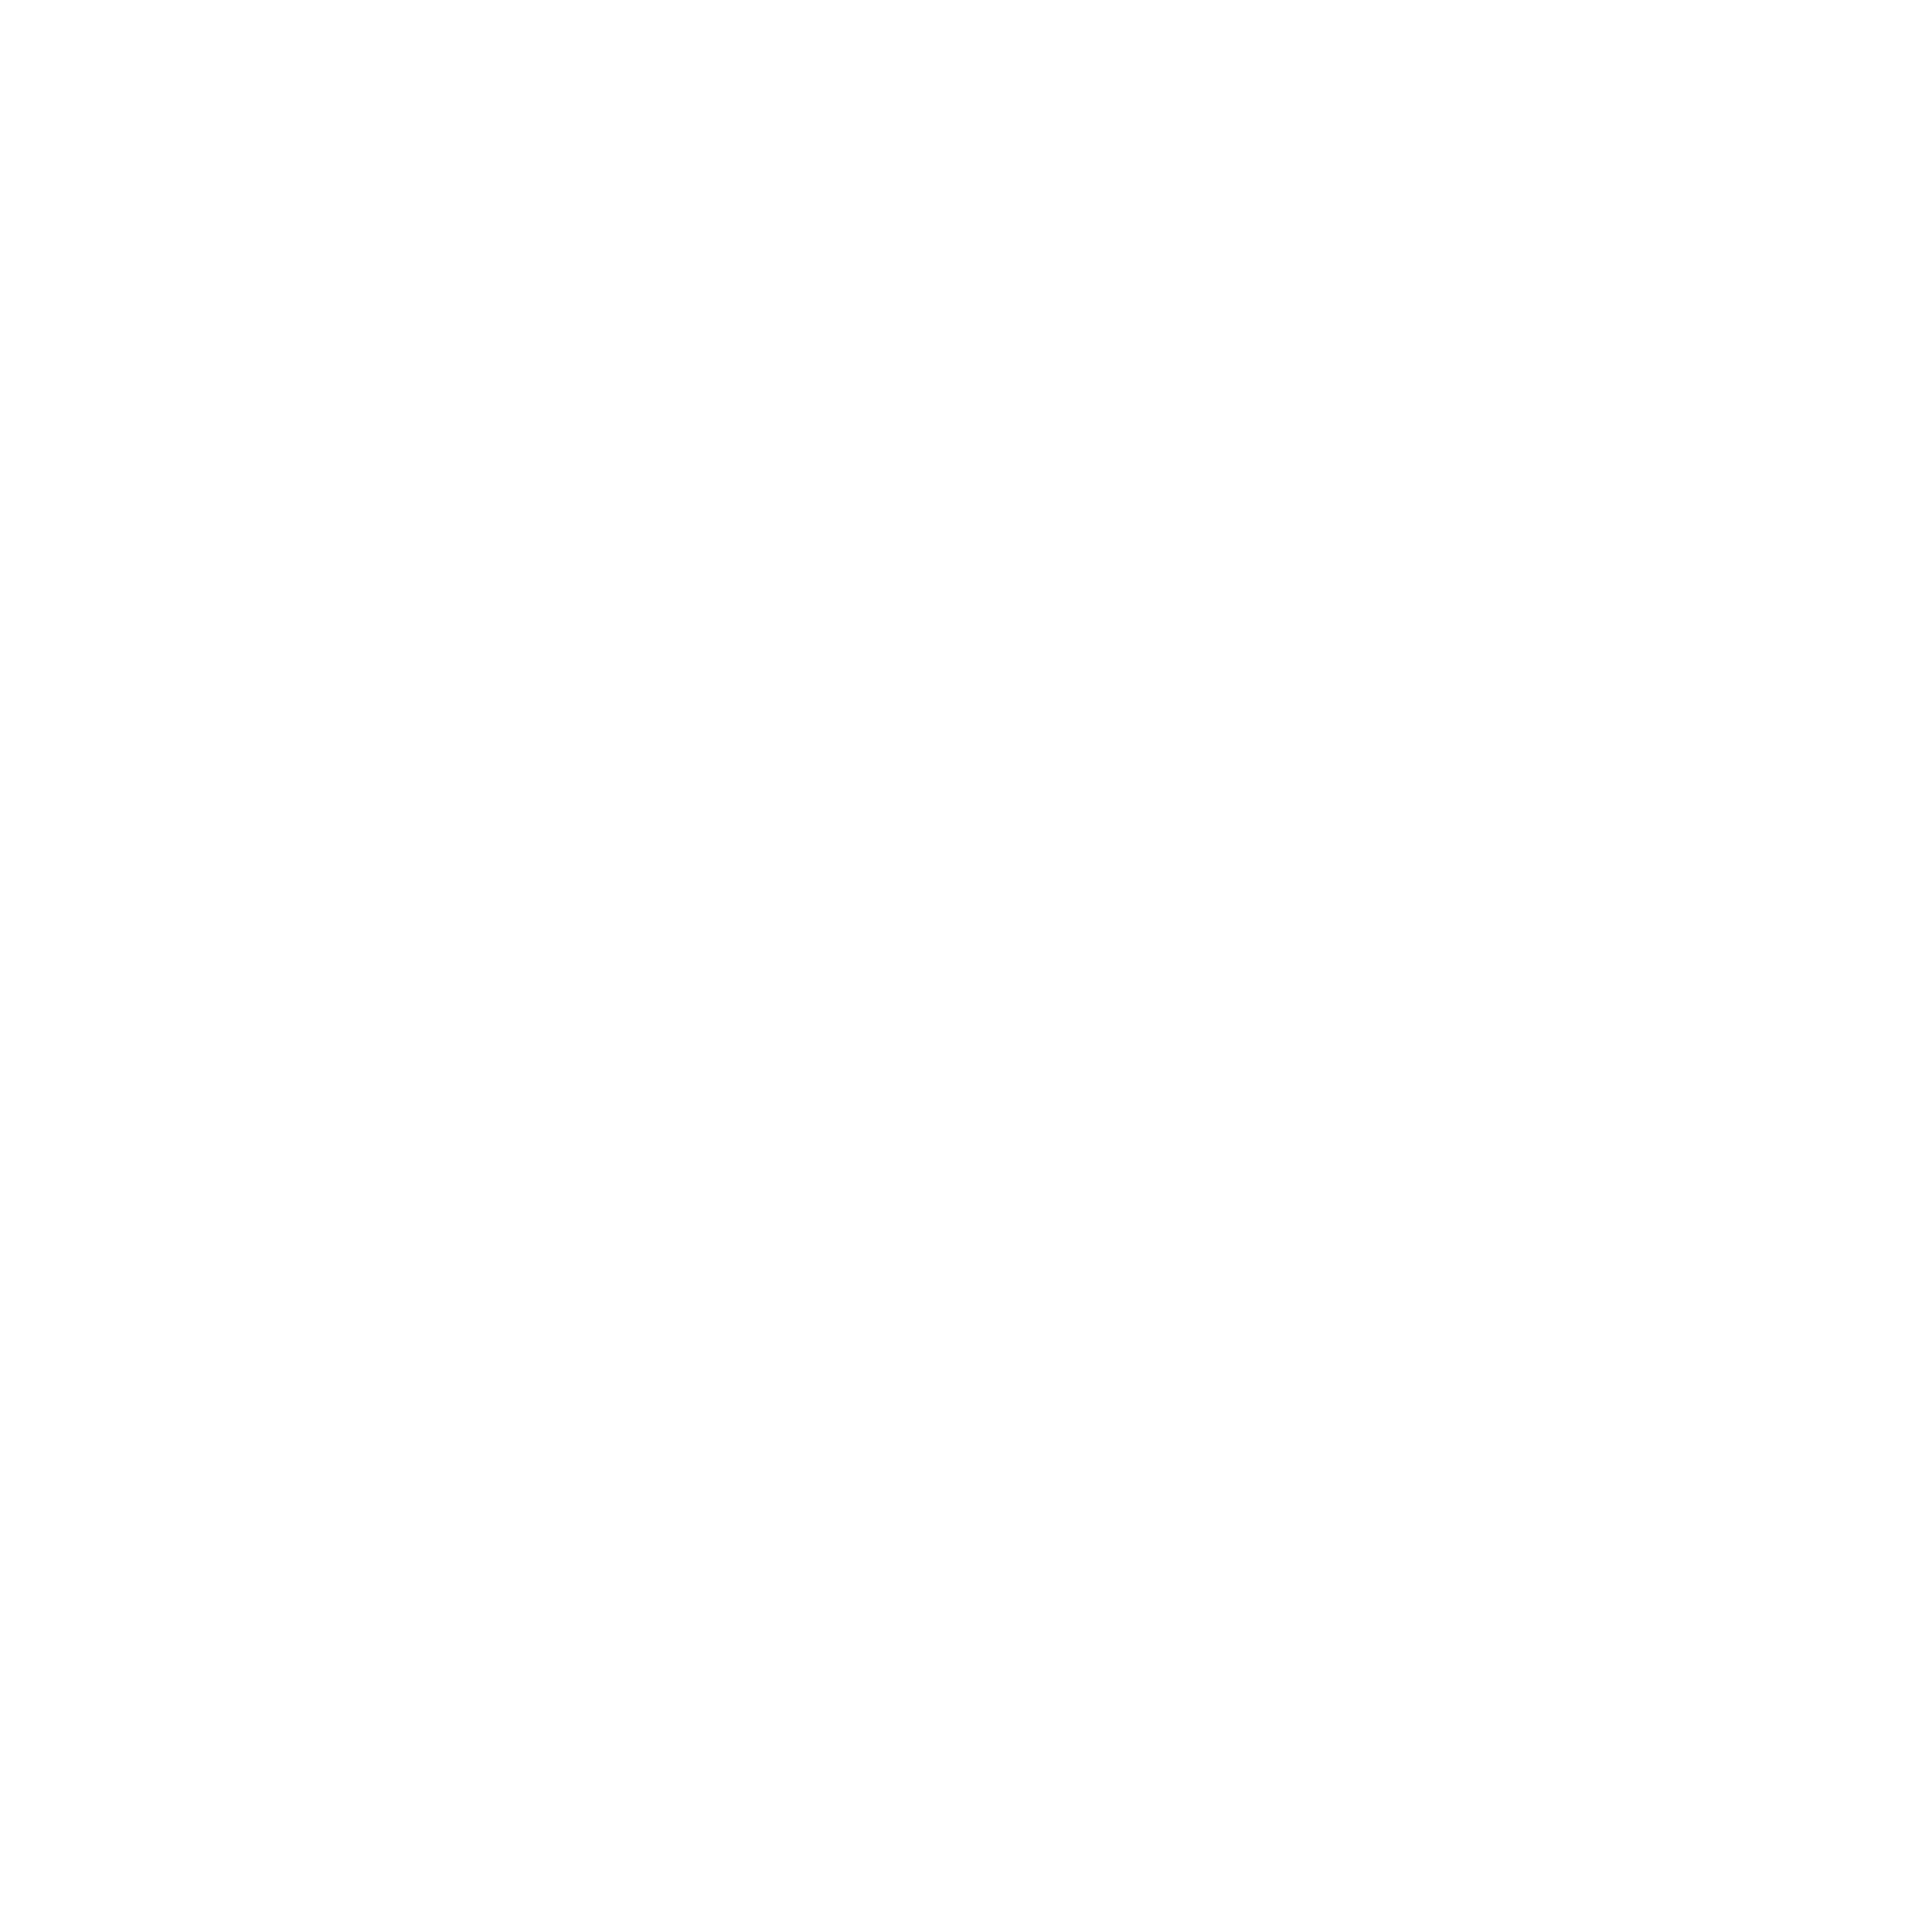 Egghead-Restaurant